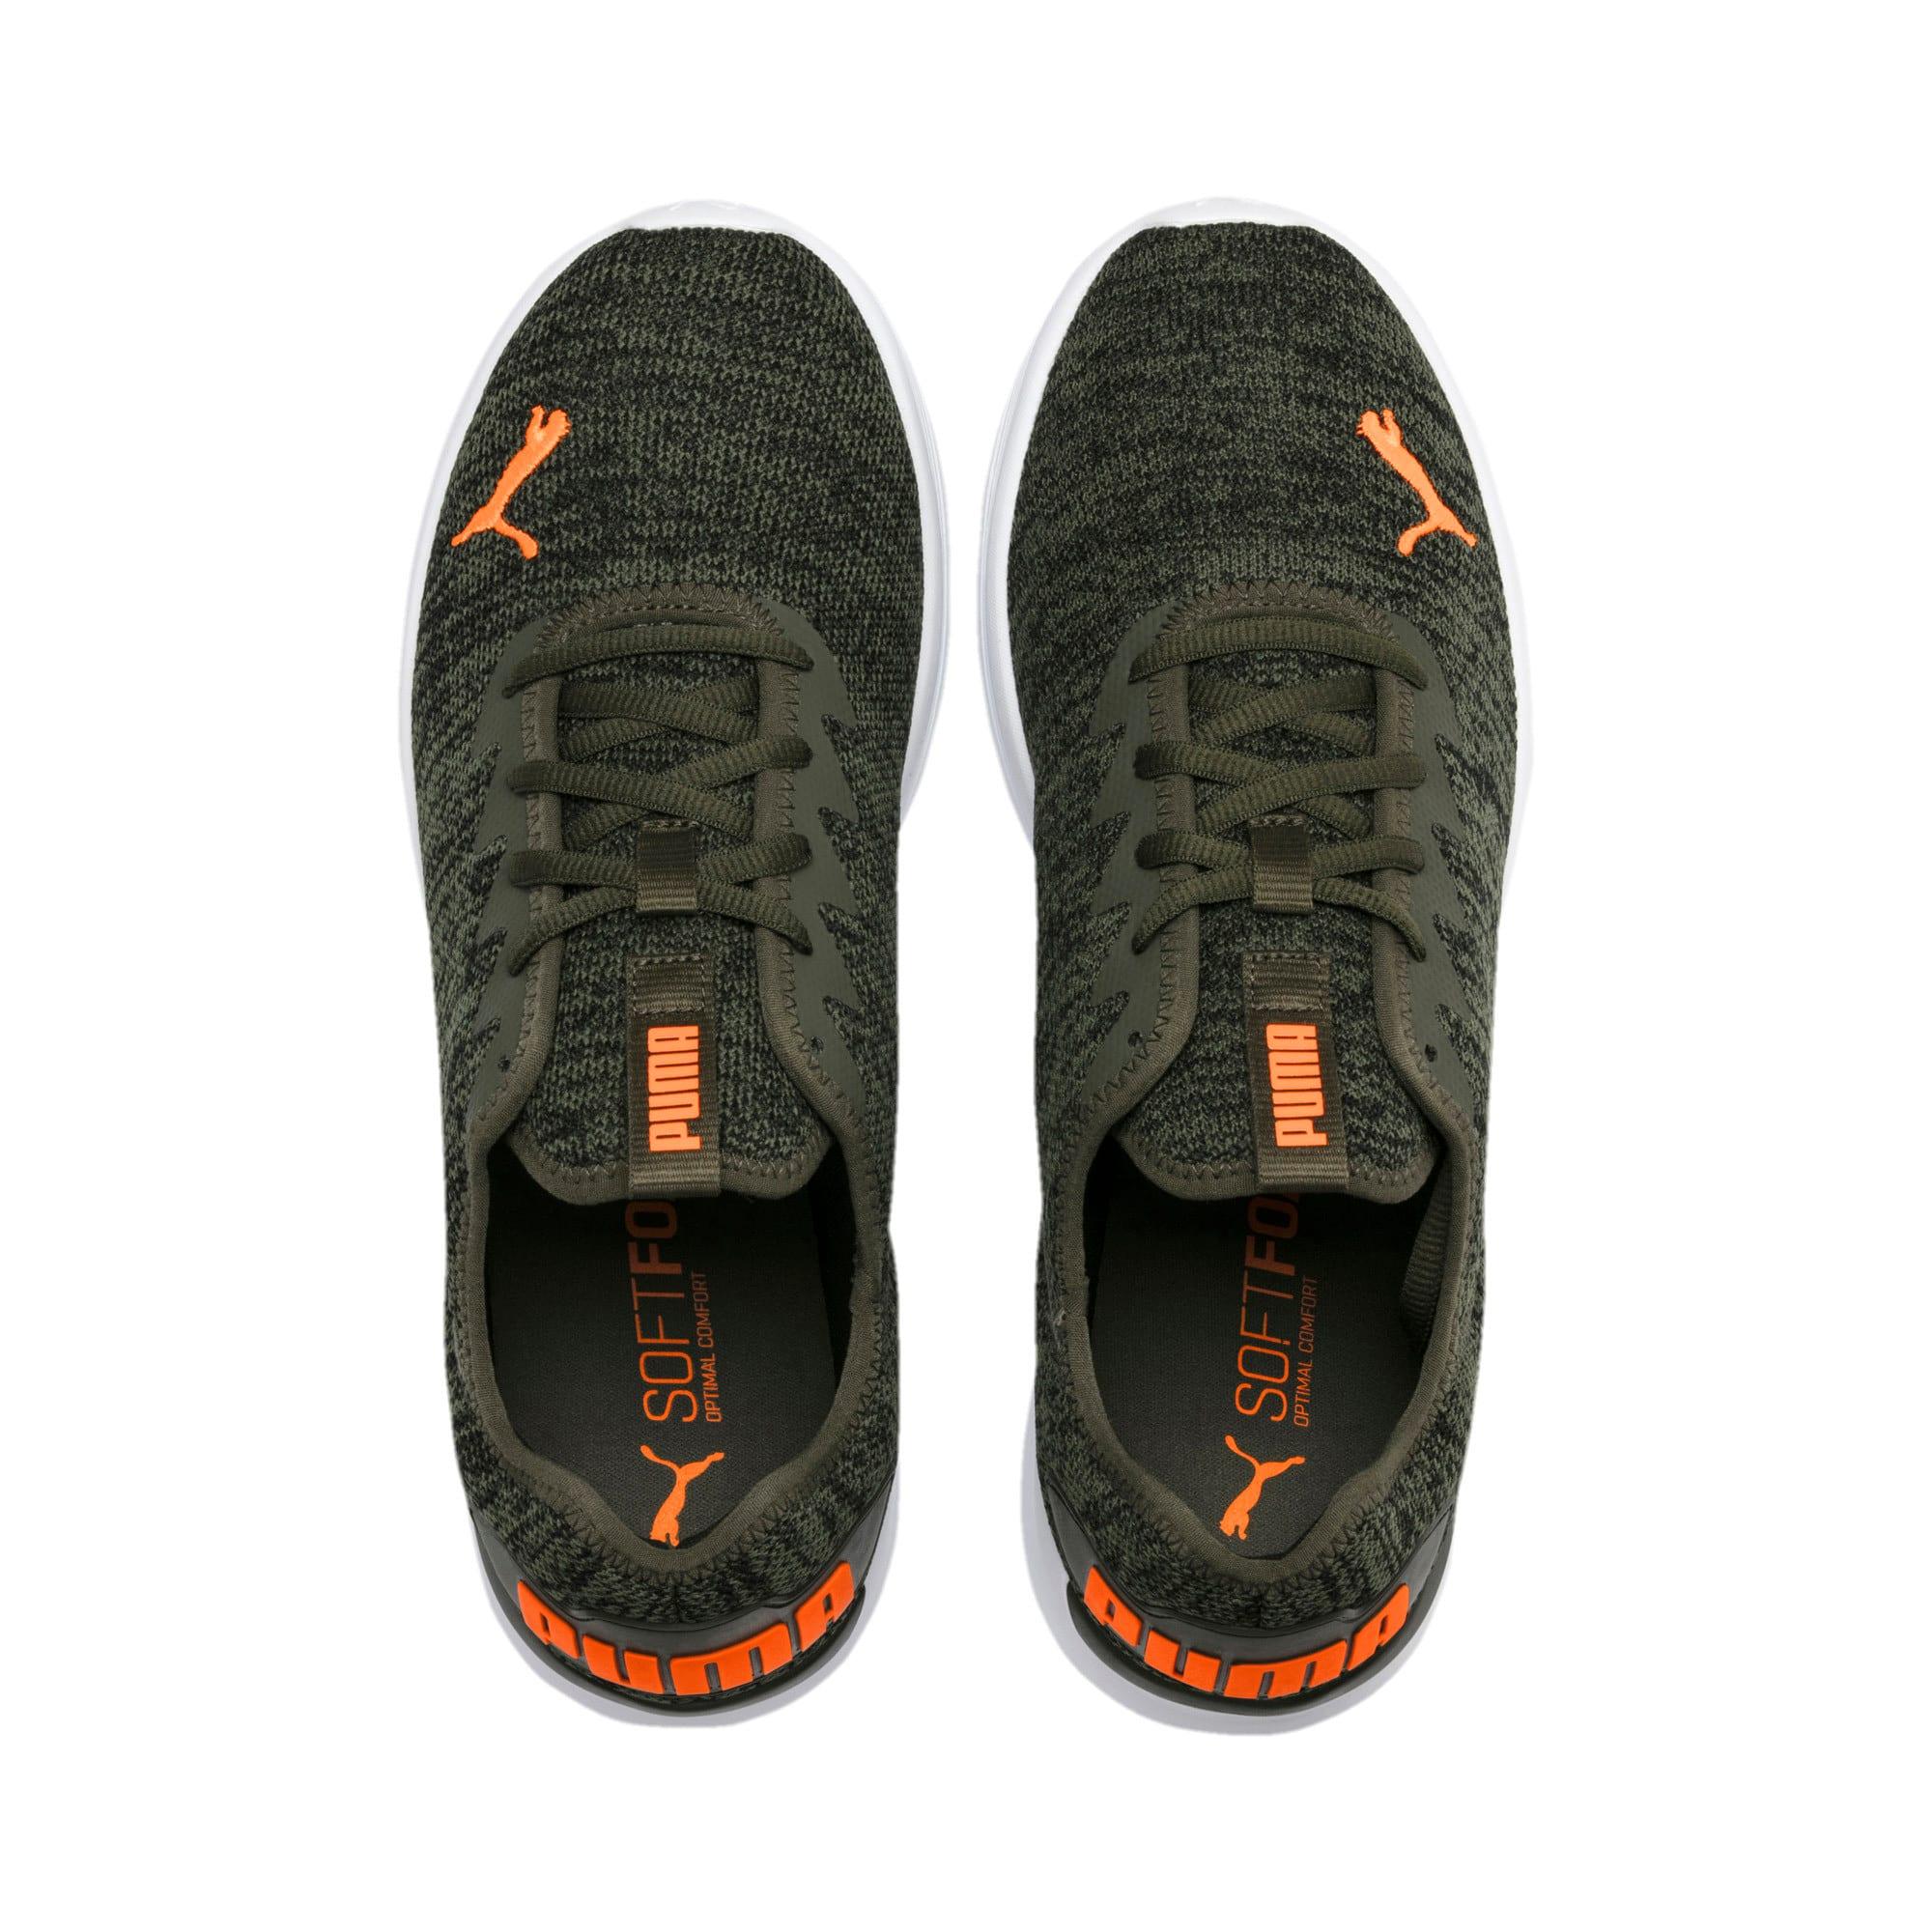 Thumbnail 7 of Ballast Men's Running Shoes, Forest Night-Black-Orange, medium